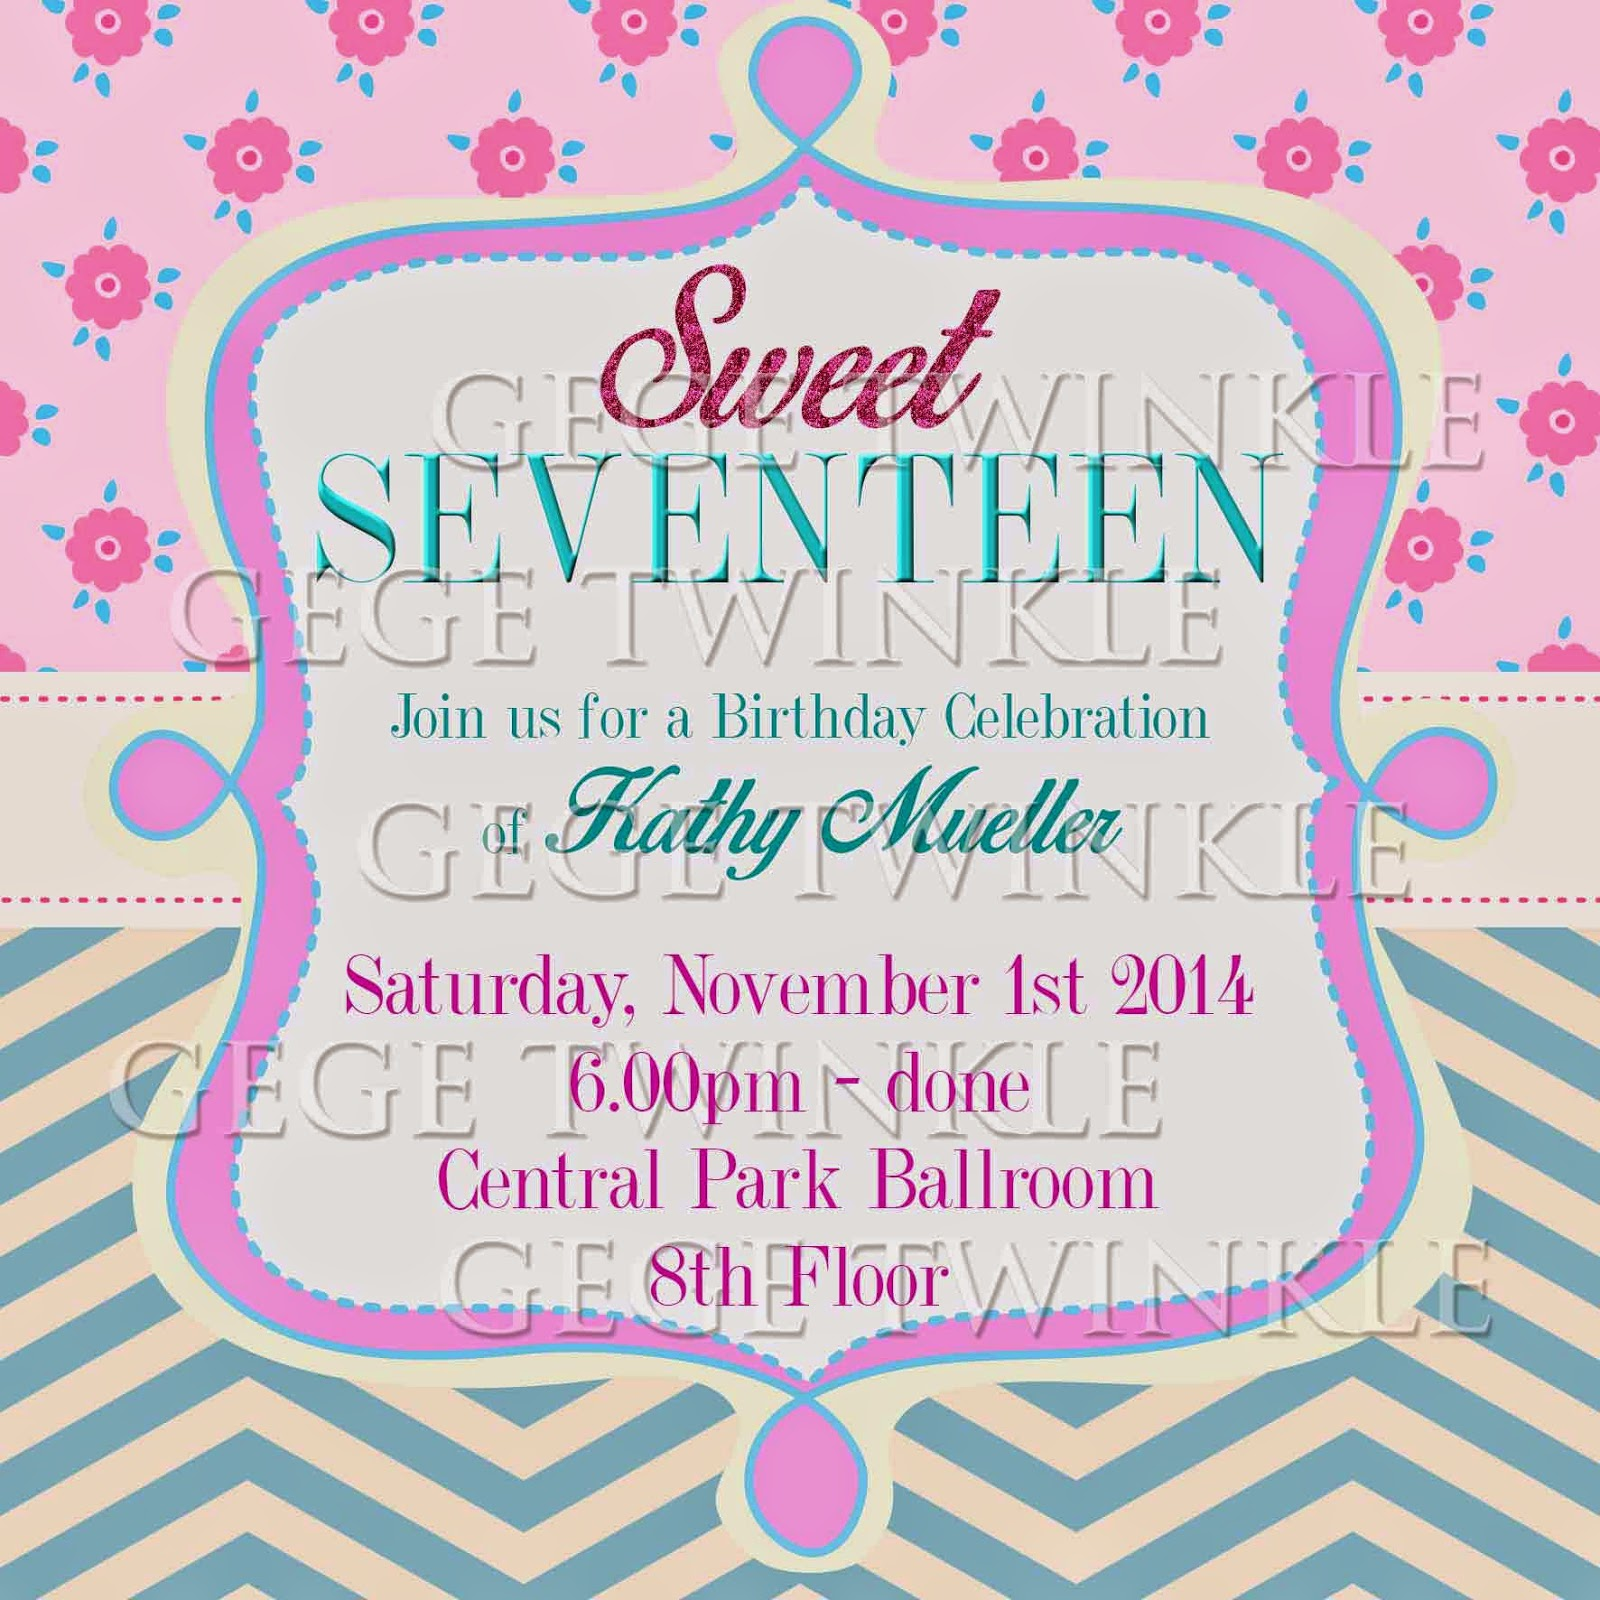 Invitation card birthday party sweet seventeen invitationswedd invitation card birthday sweet seventeen various stopboris Image collections